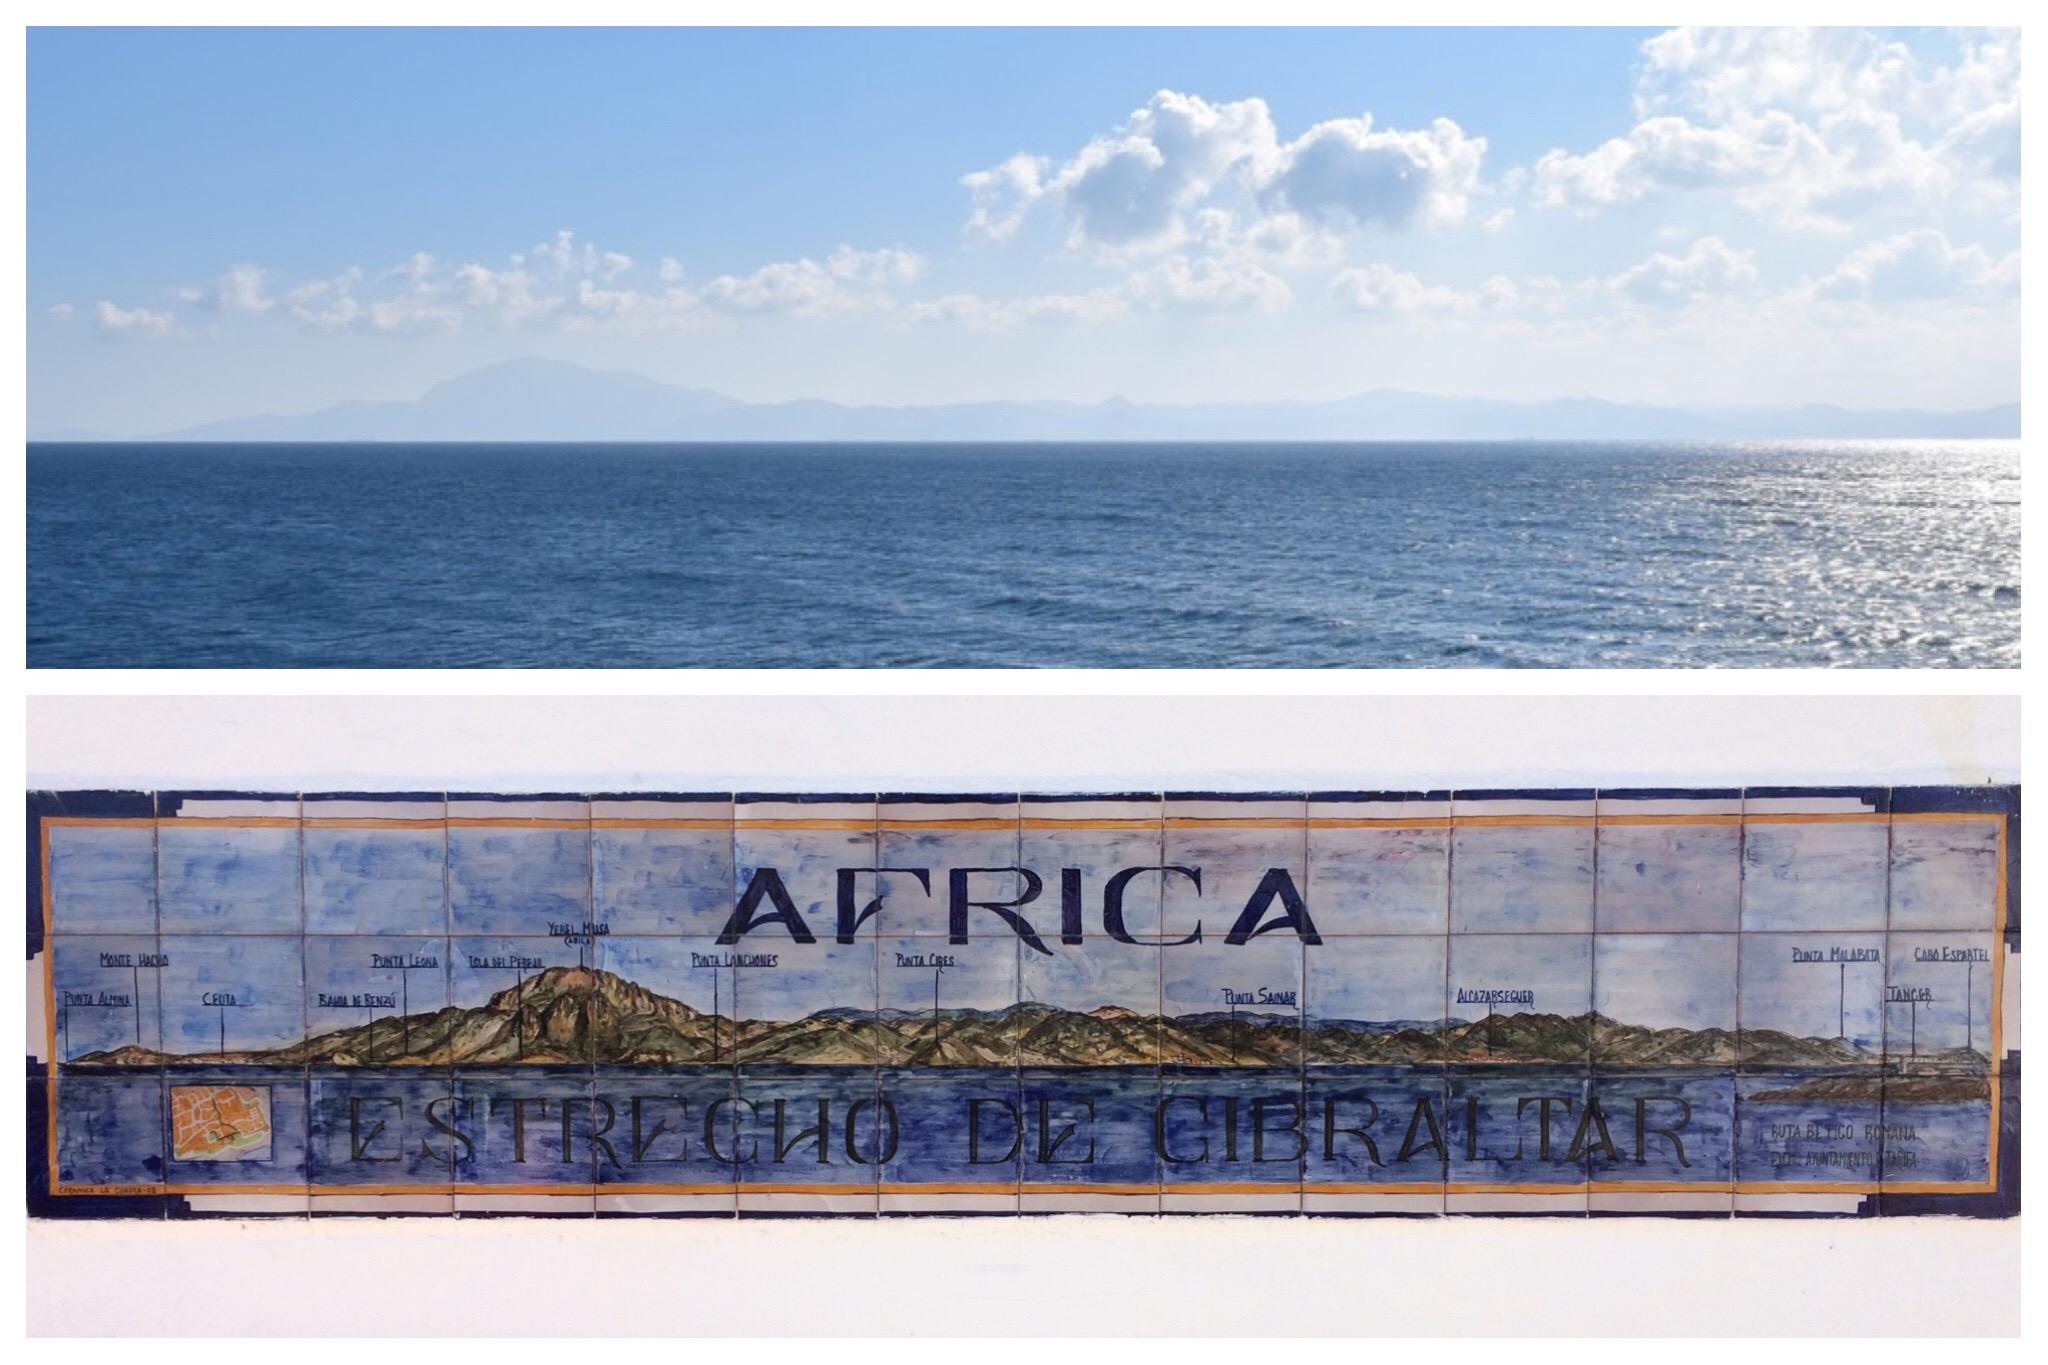 Tarifa - looking across to Africa